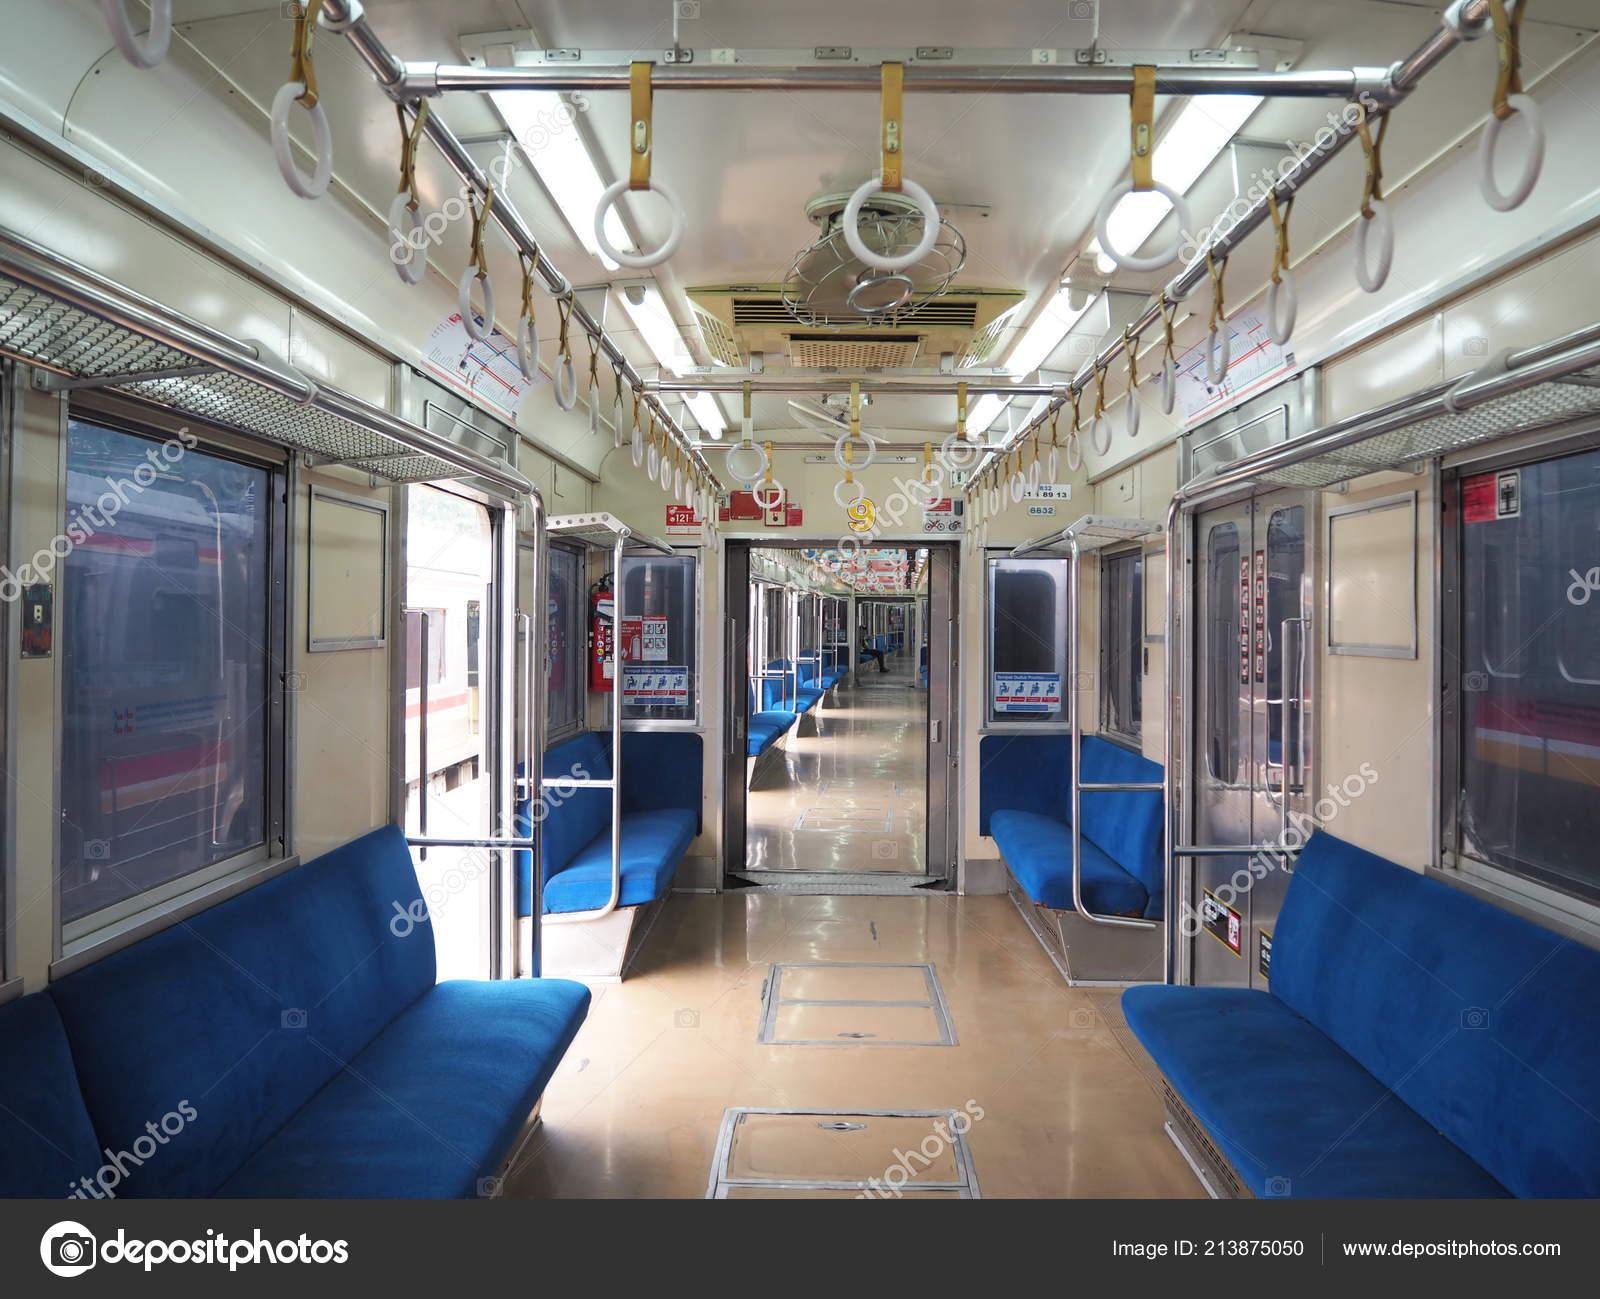 Jakarta Indonesia August 2018 Interior Commuter Line Train Stock